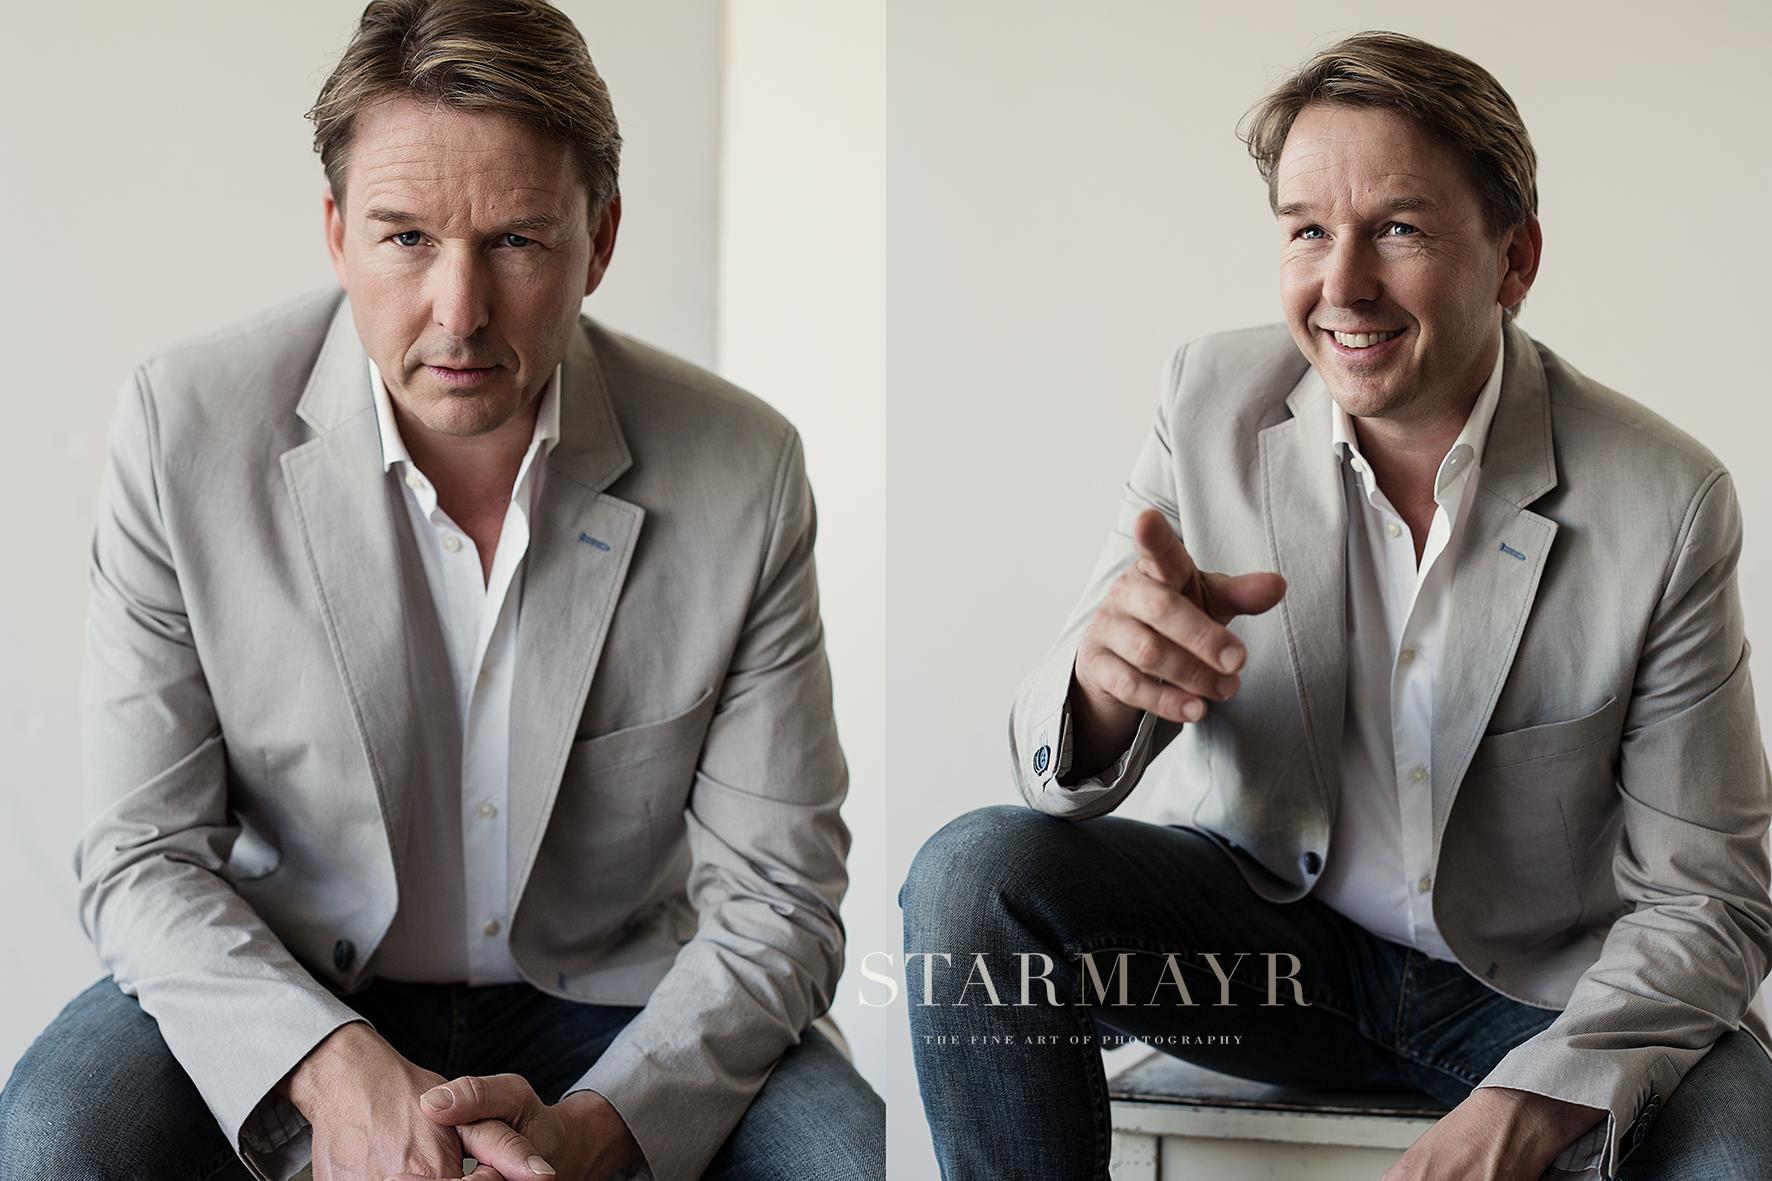 Starmayr, Serge Falck, Schauspieler, Business Portraits, Fotograf, Linz, Leonding, Sed Card 2,